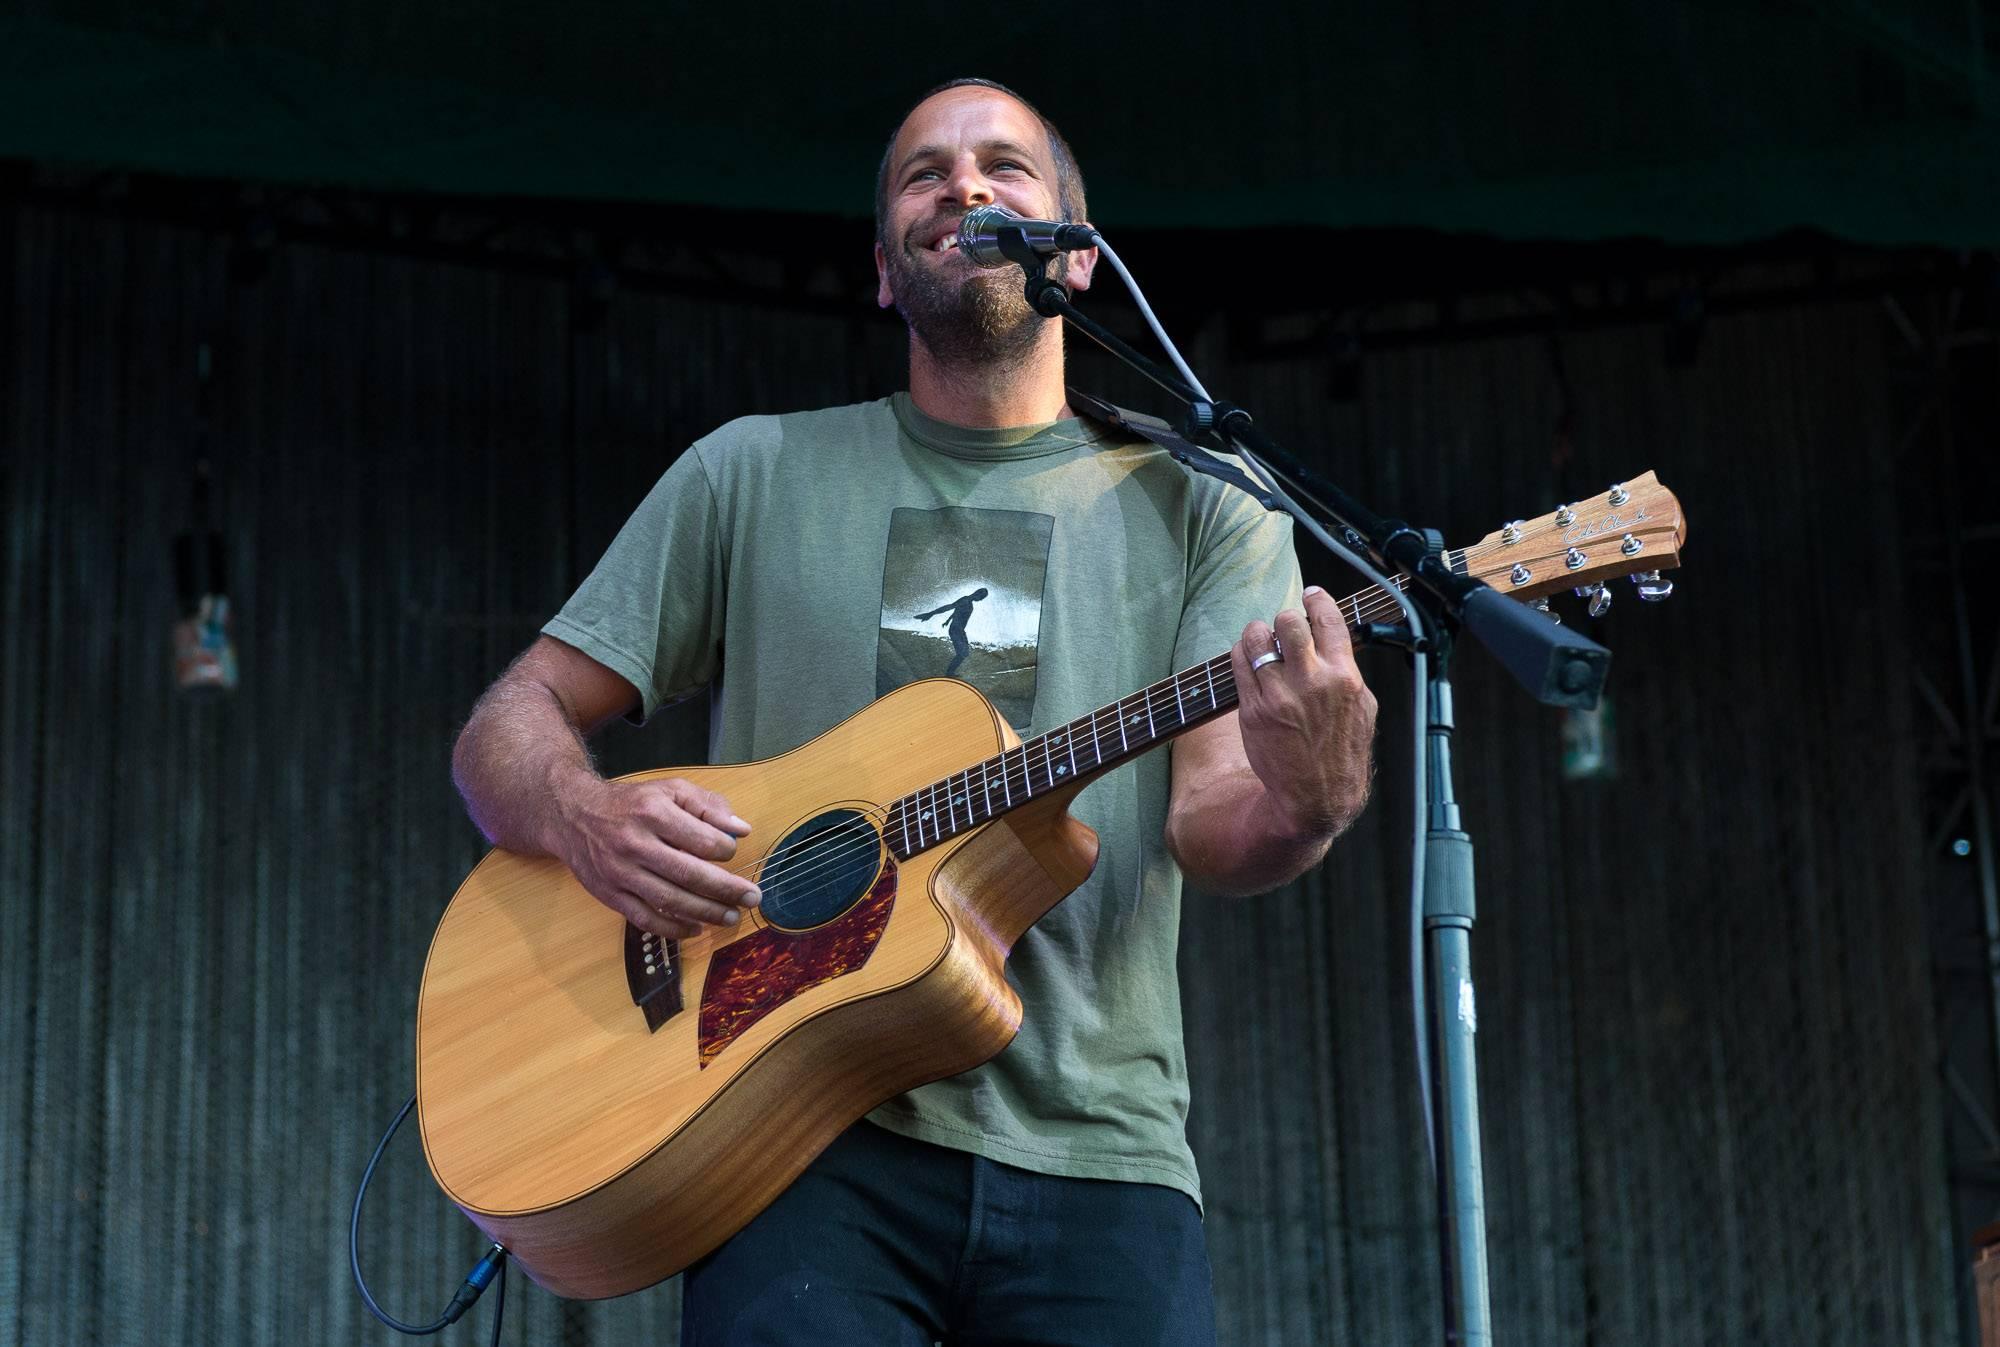 Jack Johnson at Deer Lake Park, Burnaby, July 23 2017. Jessica Vandergulik photo.